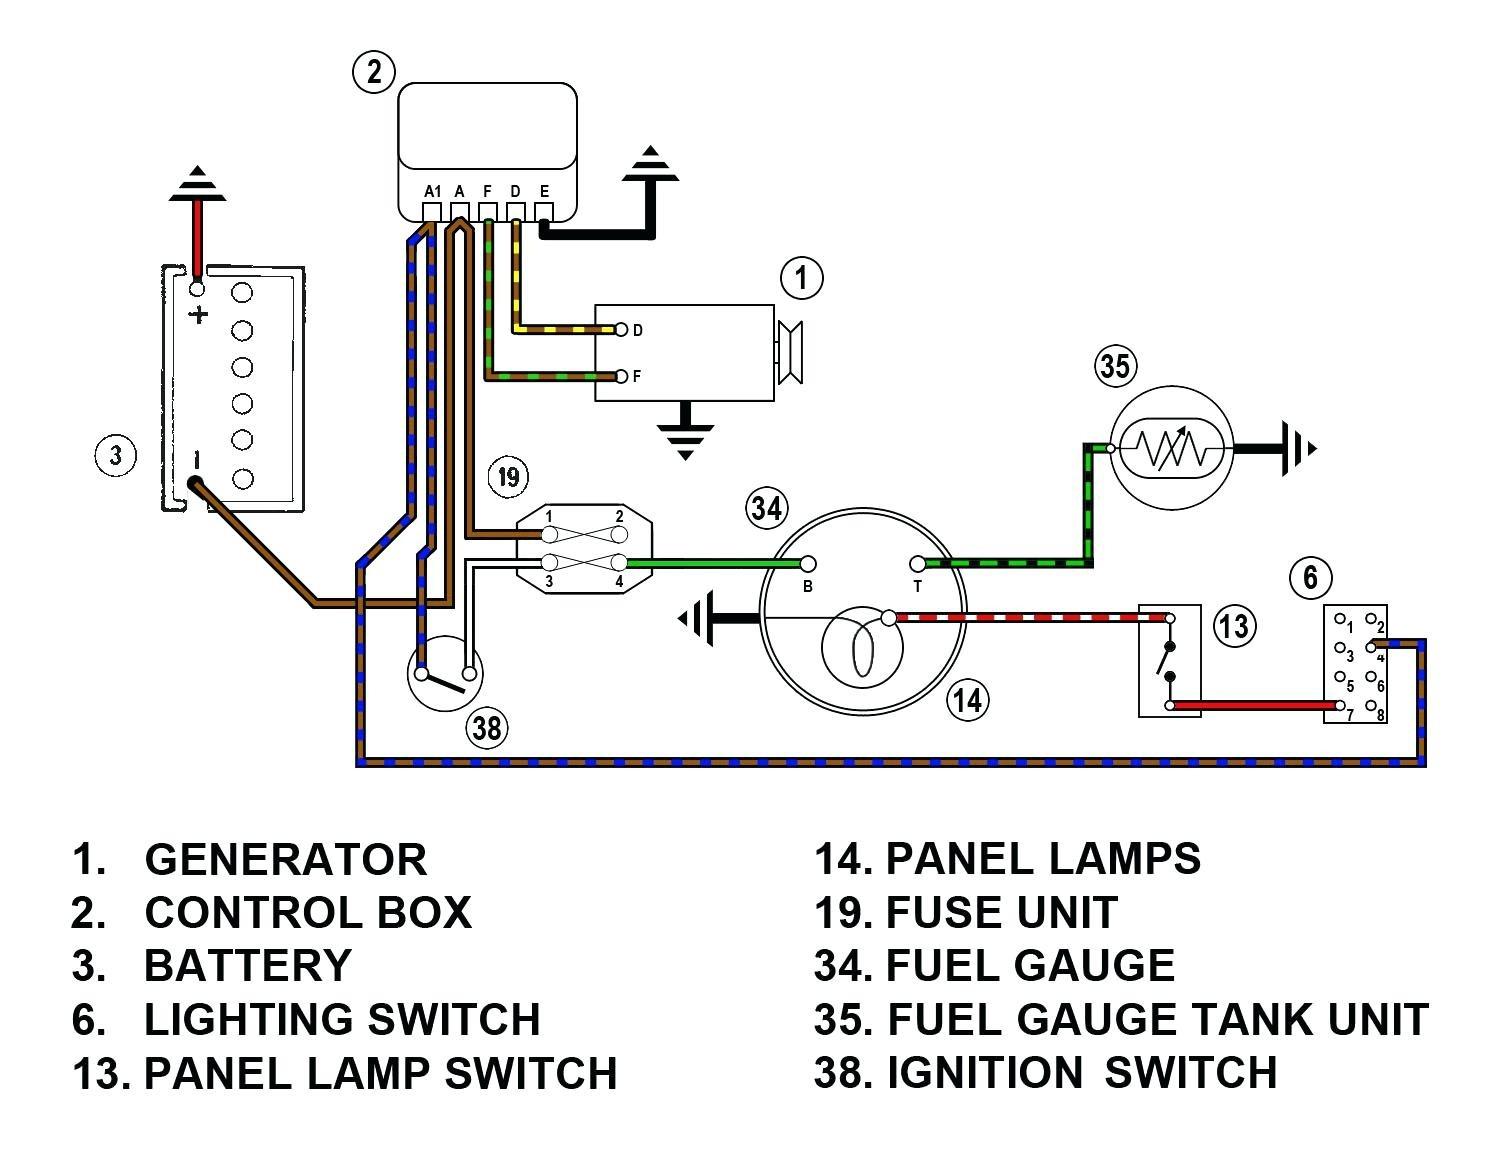 Vdo Gauges Wiring Diagrams Wiring Diagram Centre Wiring Diagram For Oil Pressure Gauge